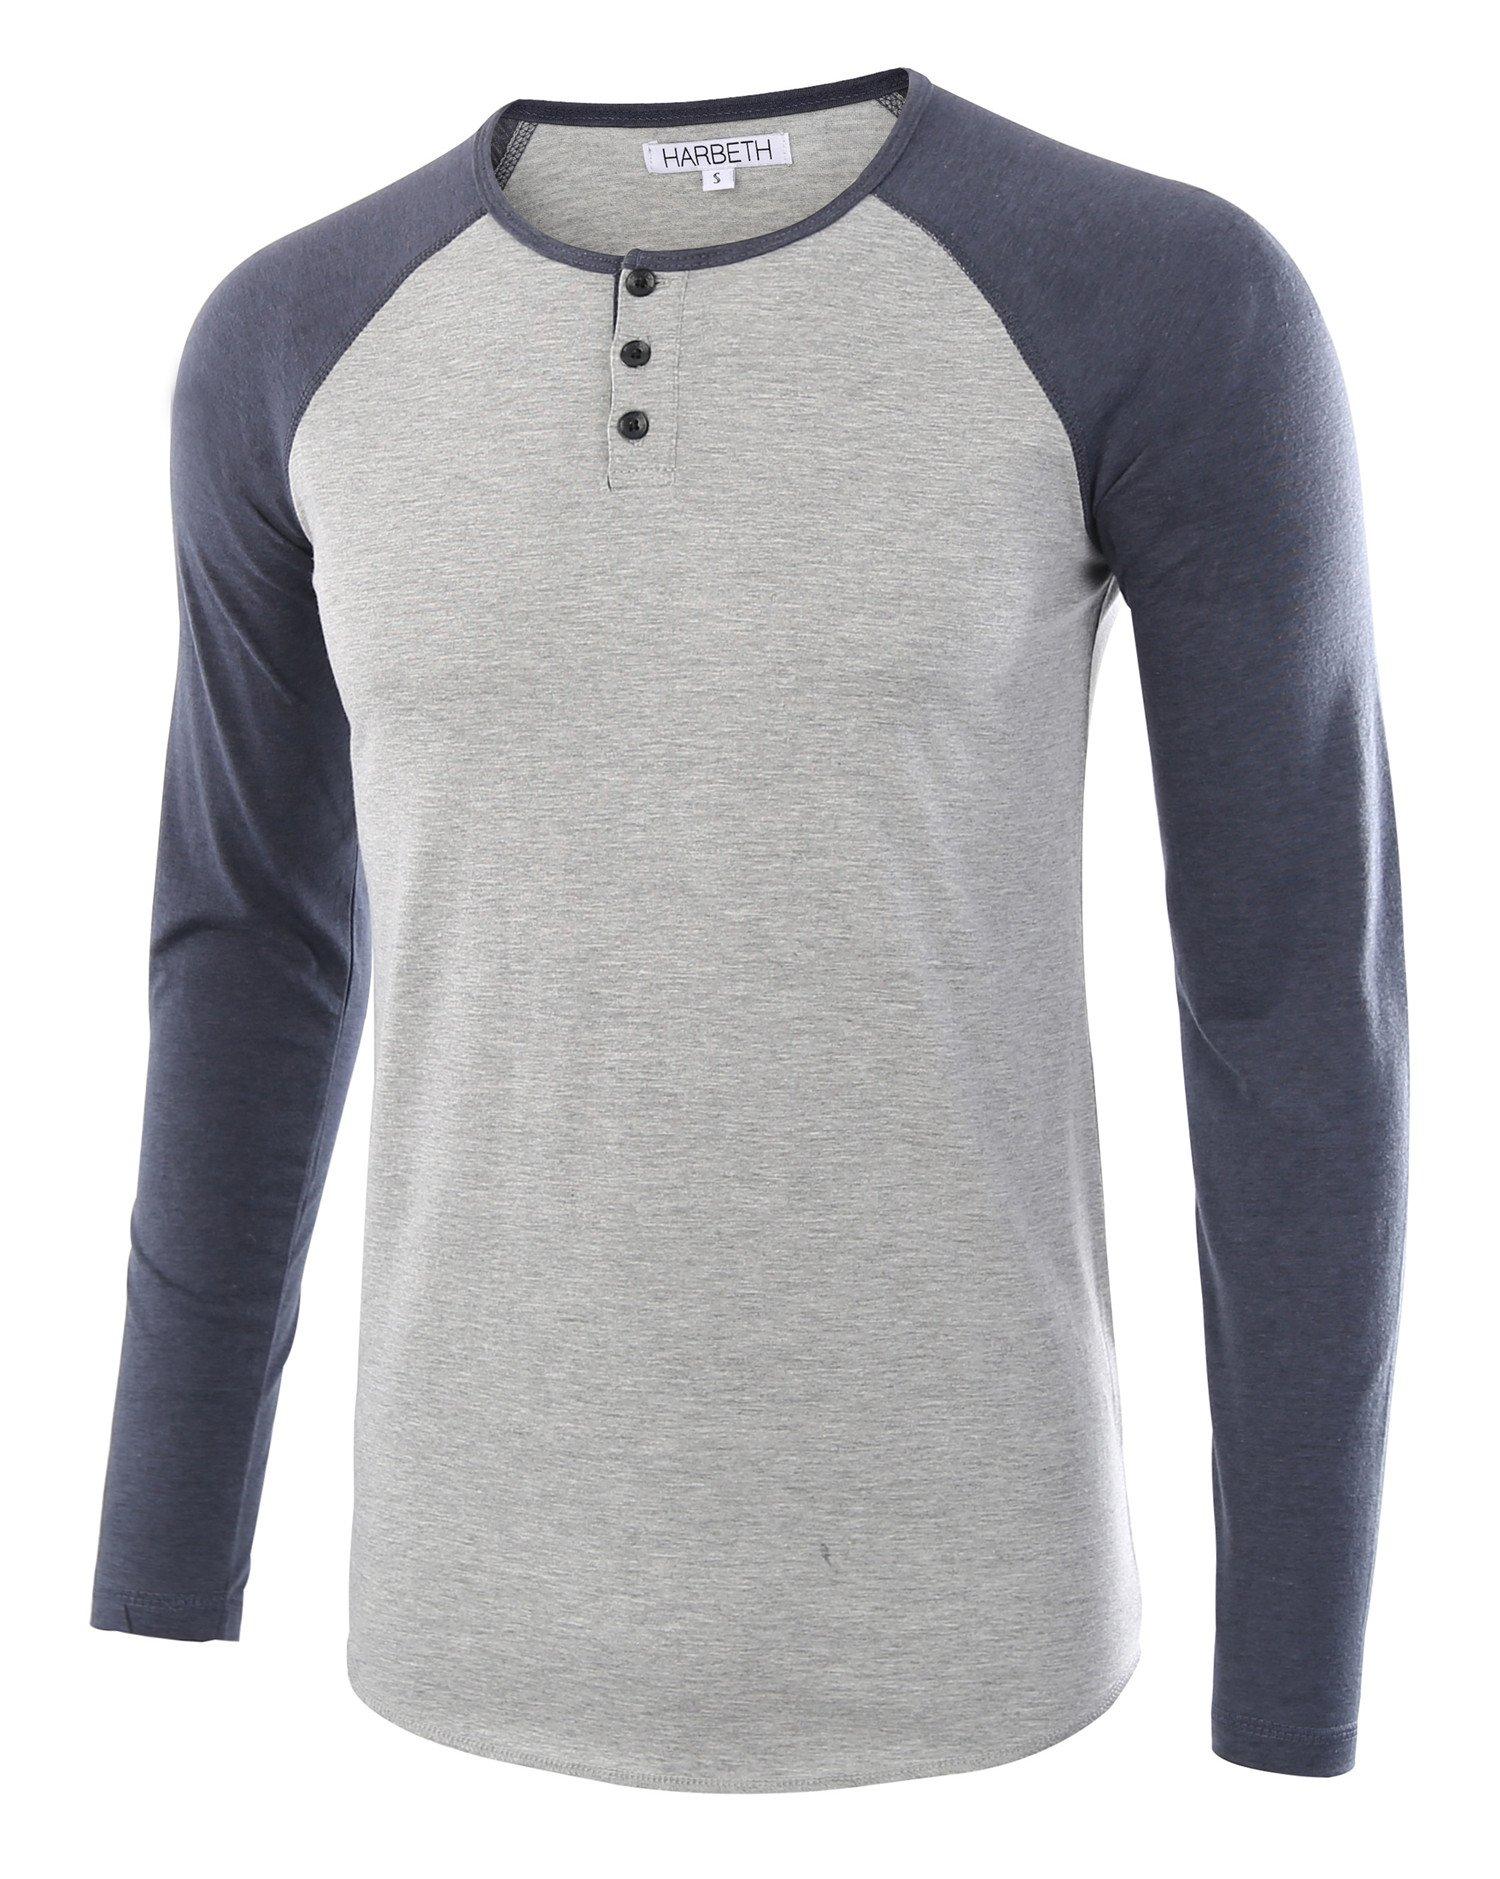 HARBETH Men's Casual Long Sleeve Henley Shirt Raglan Fit Baseball T-Shirts Tee H.Gray/C.Blue M